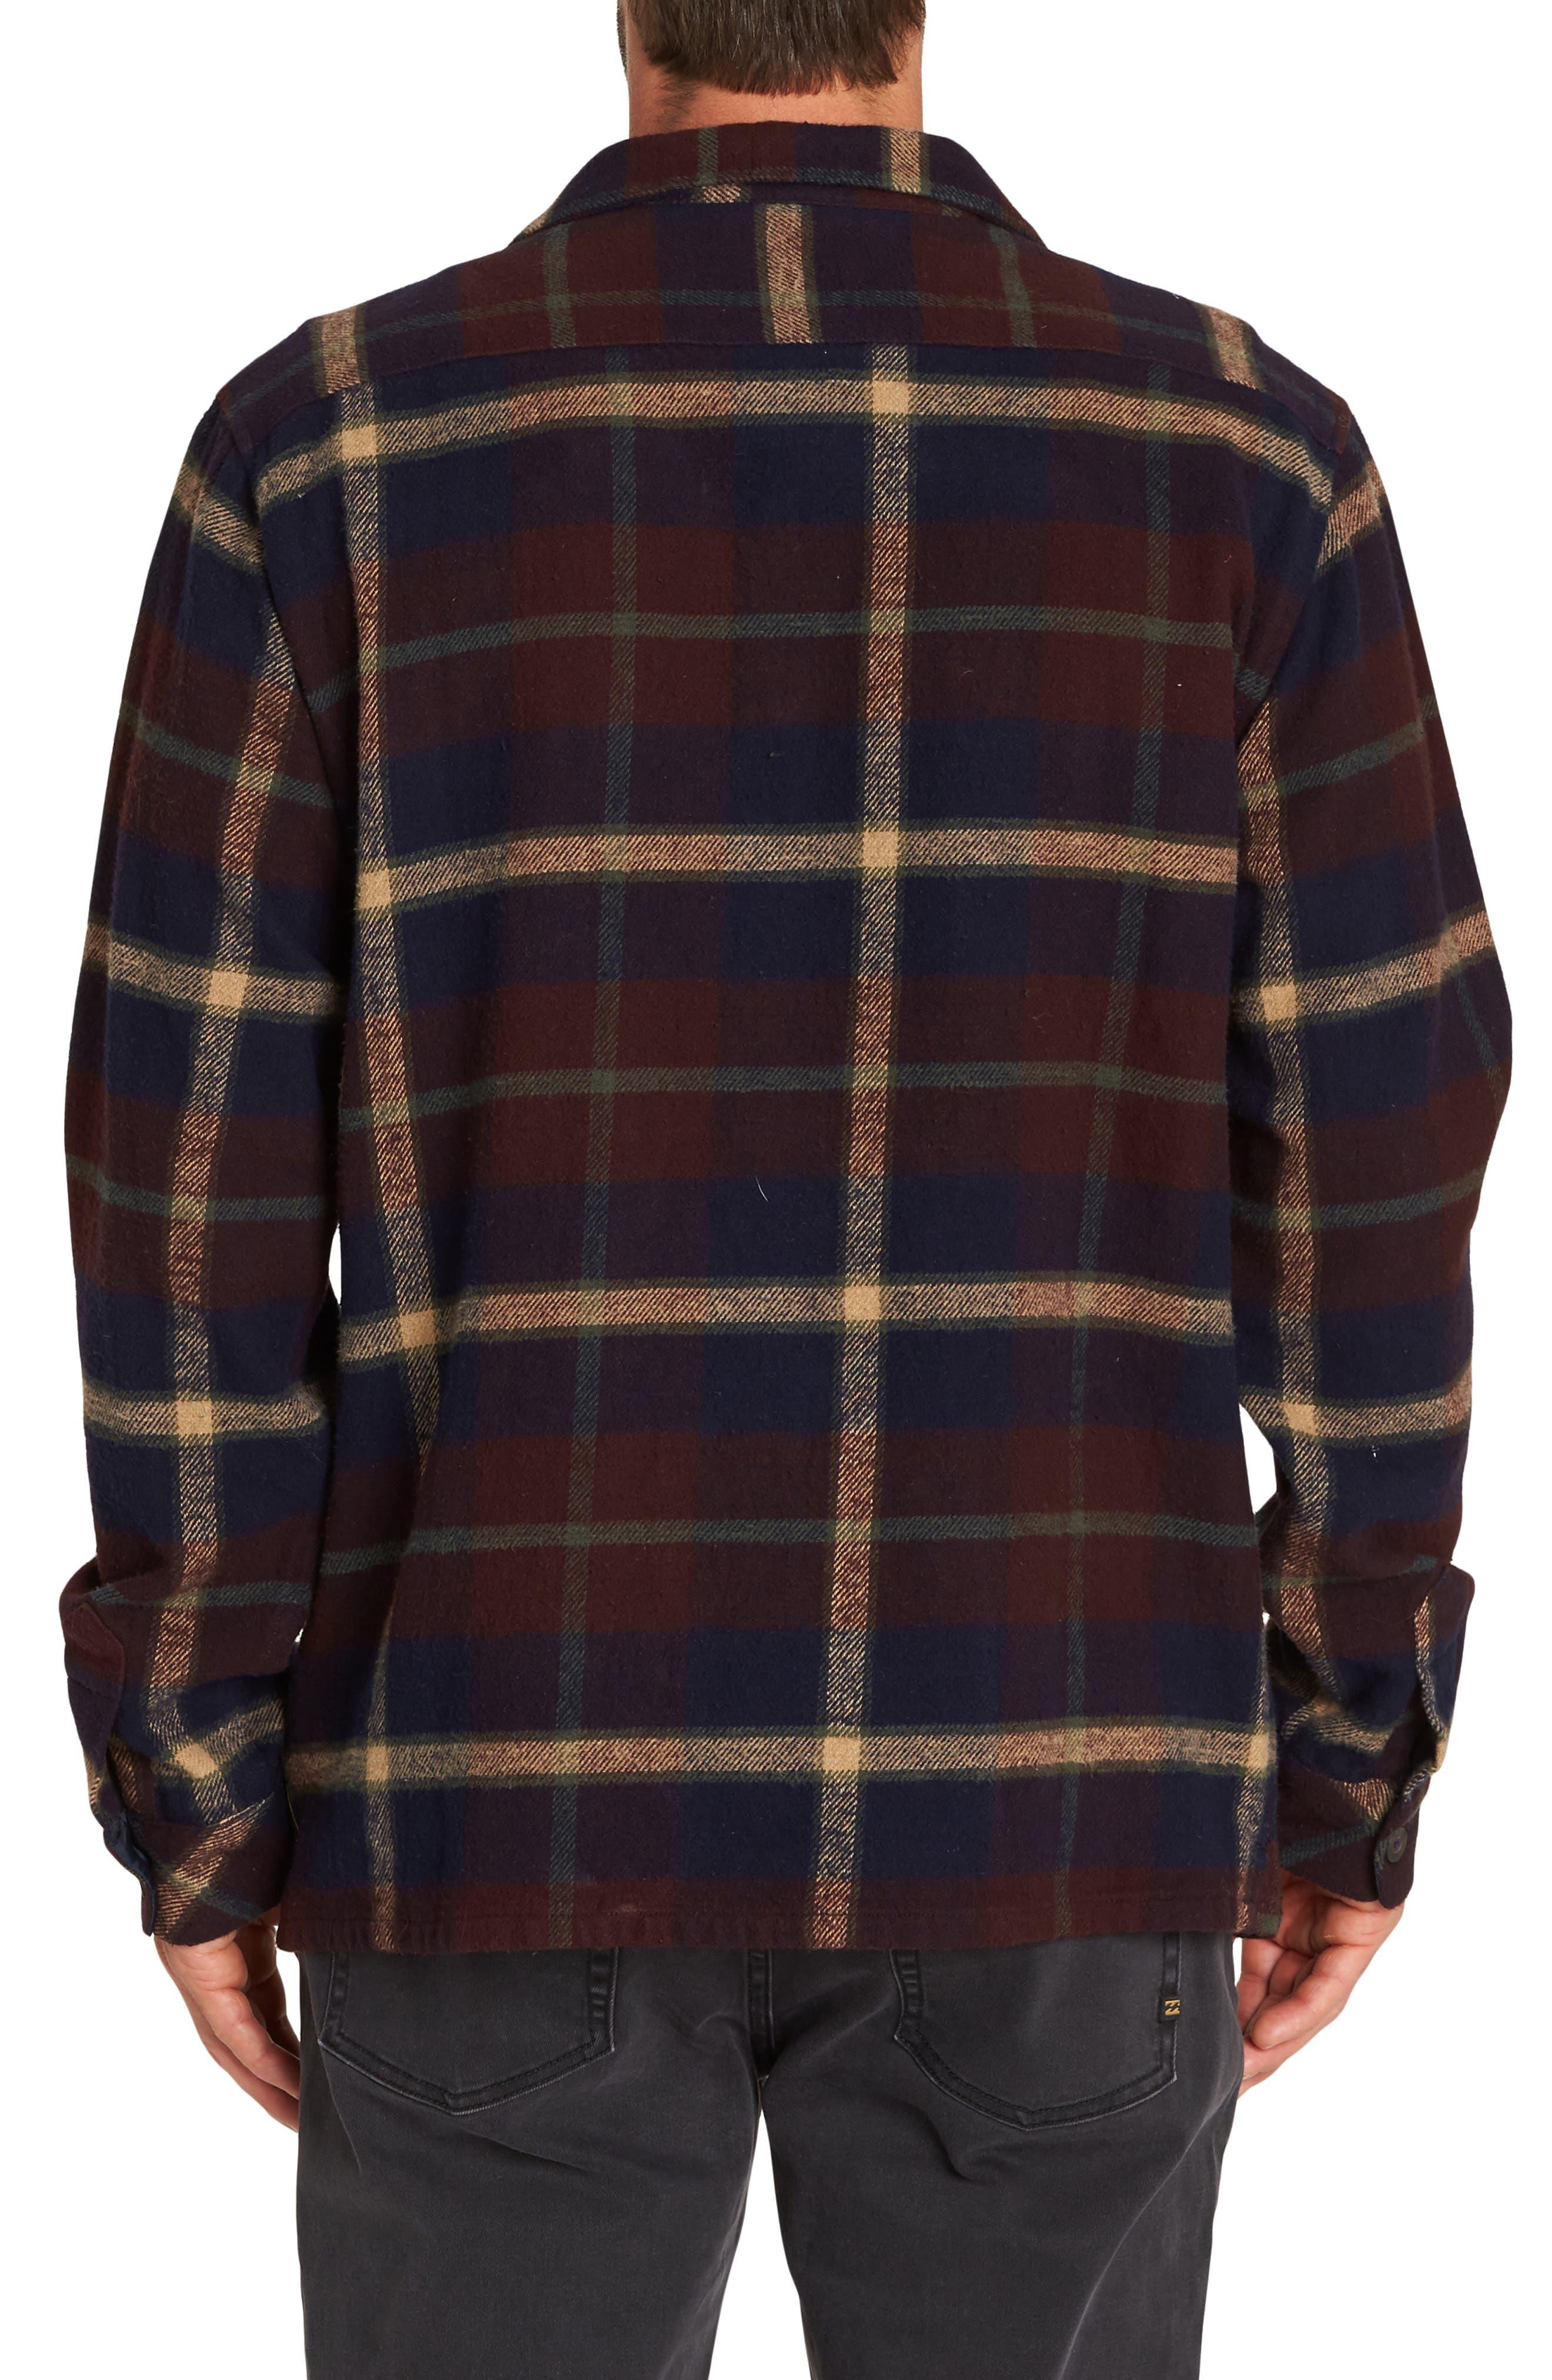 BILLABONG,                             The Point Plaid Flannel Shirt Jacket,                             Alternate thumbnail 2, color,                             NAVY